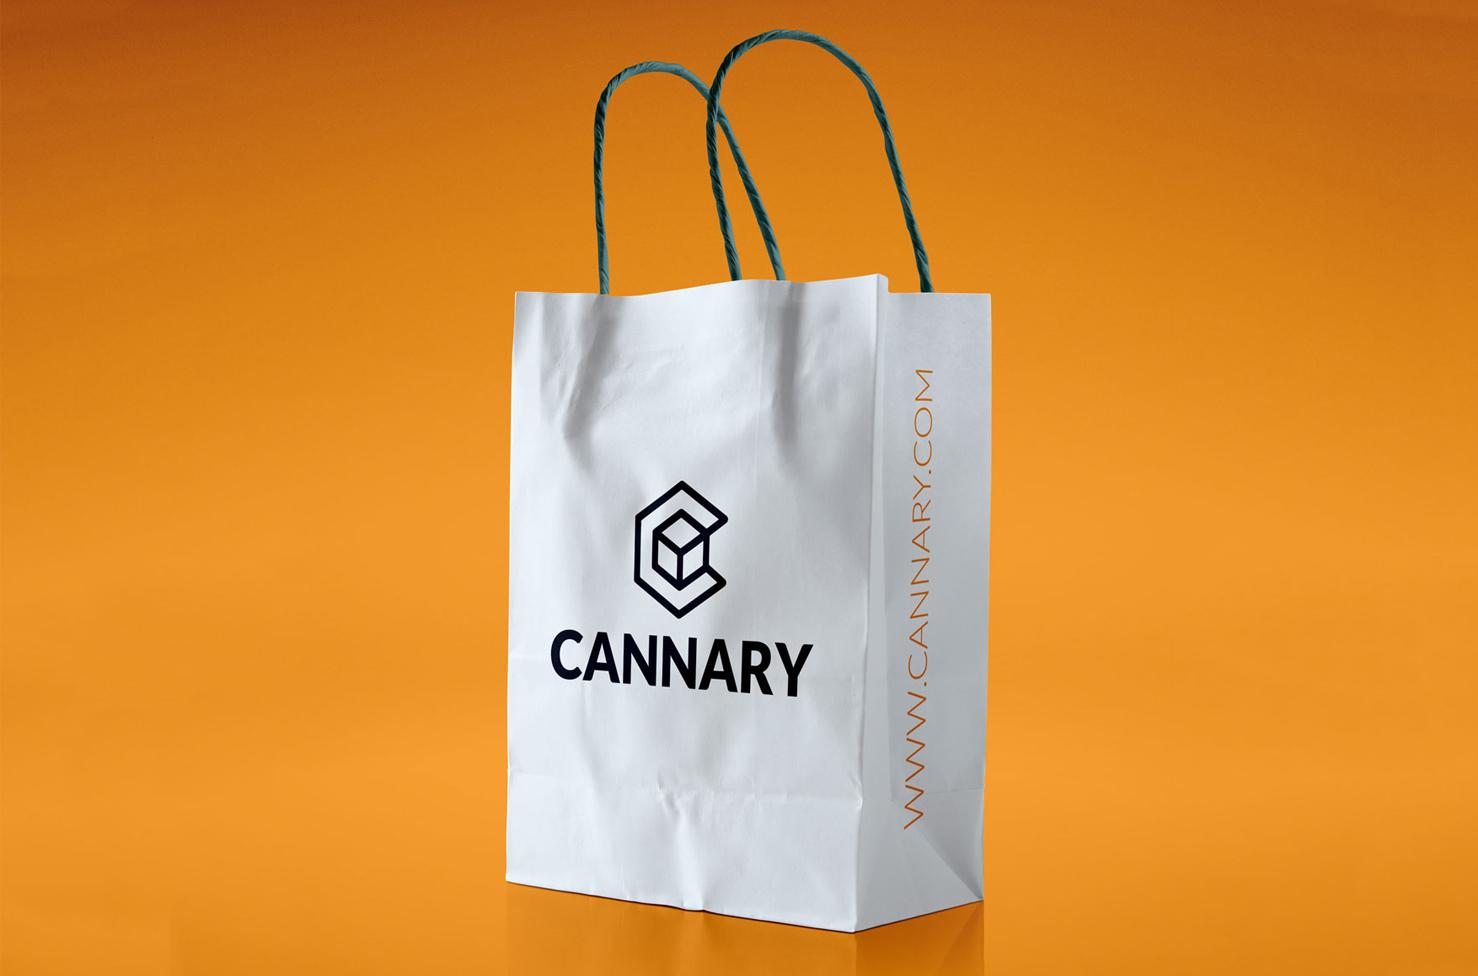 Cannarybag-gallery.jpg